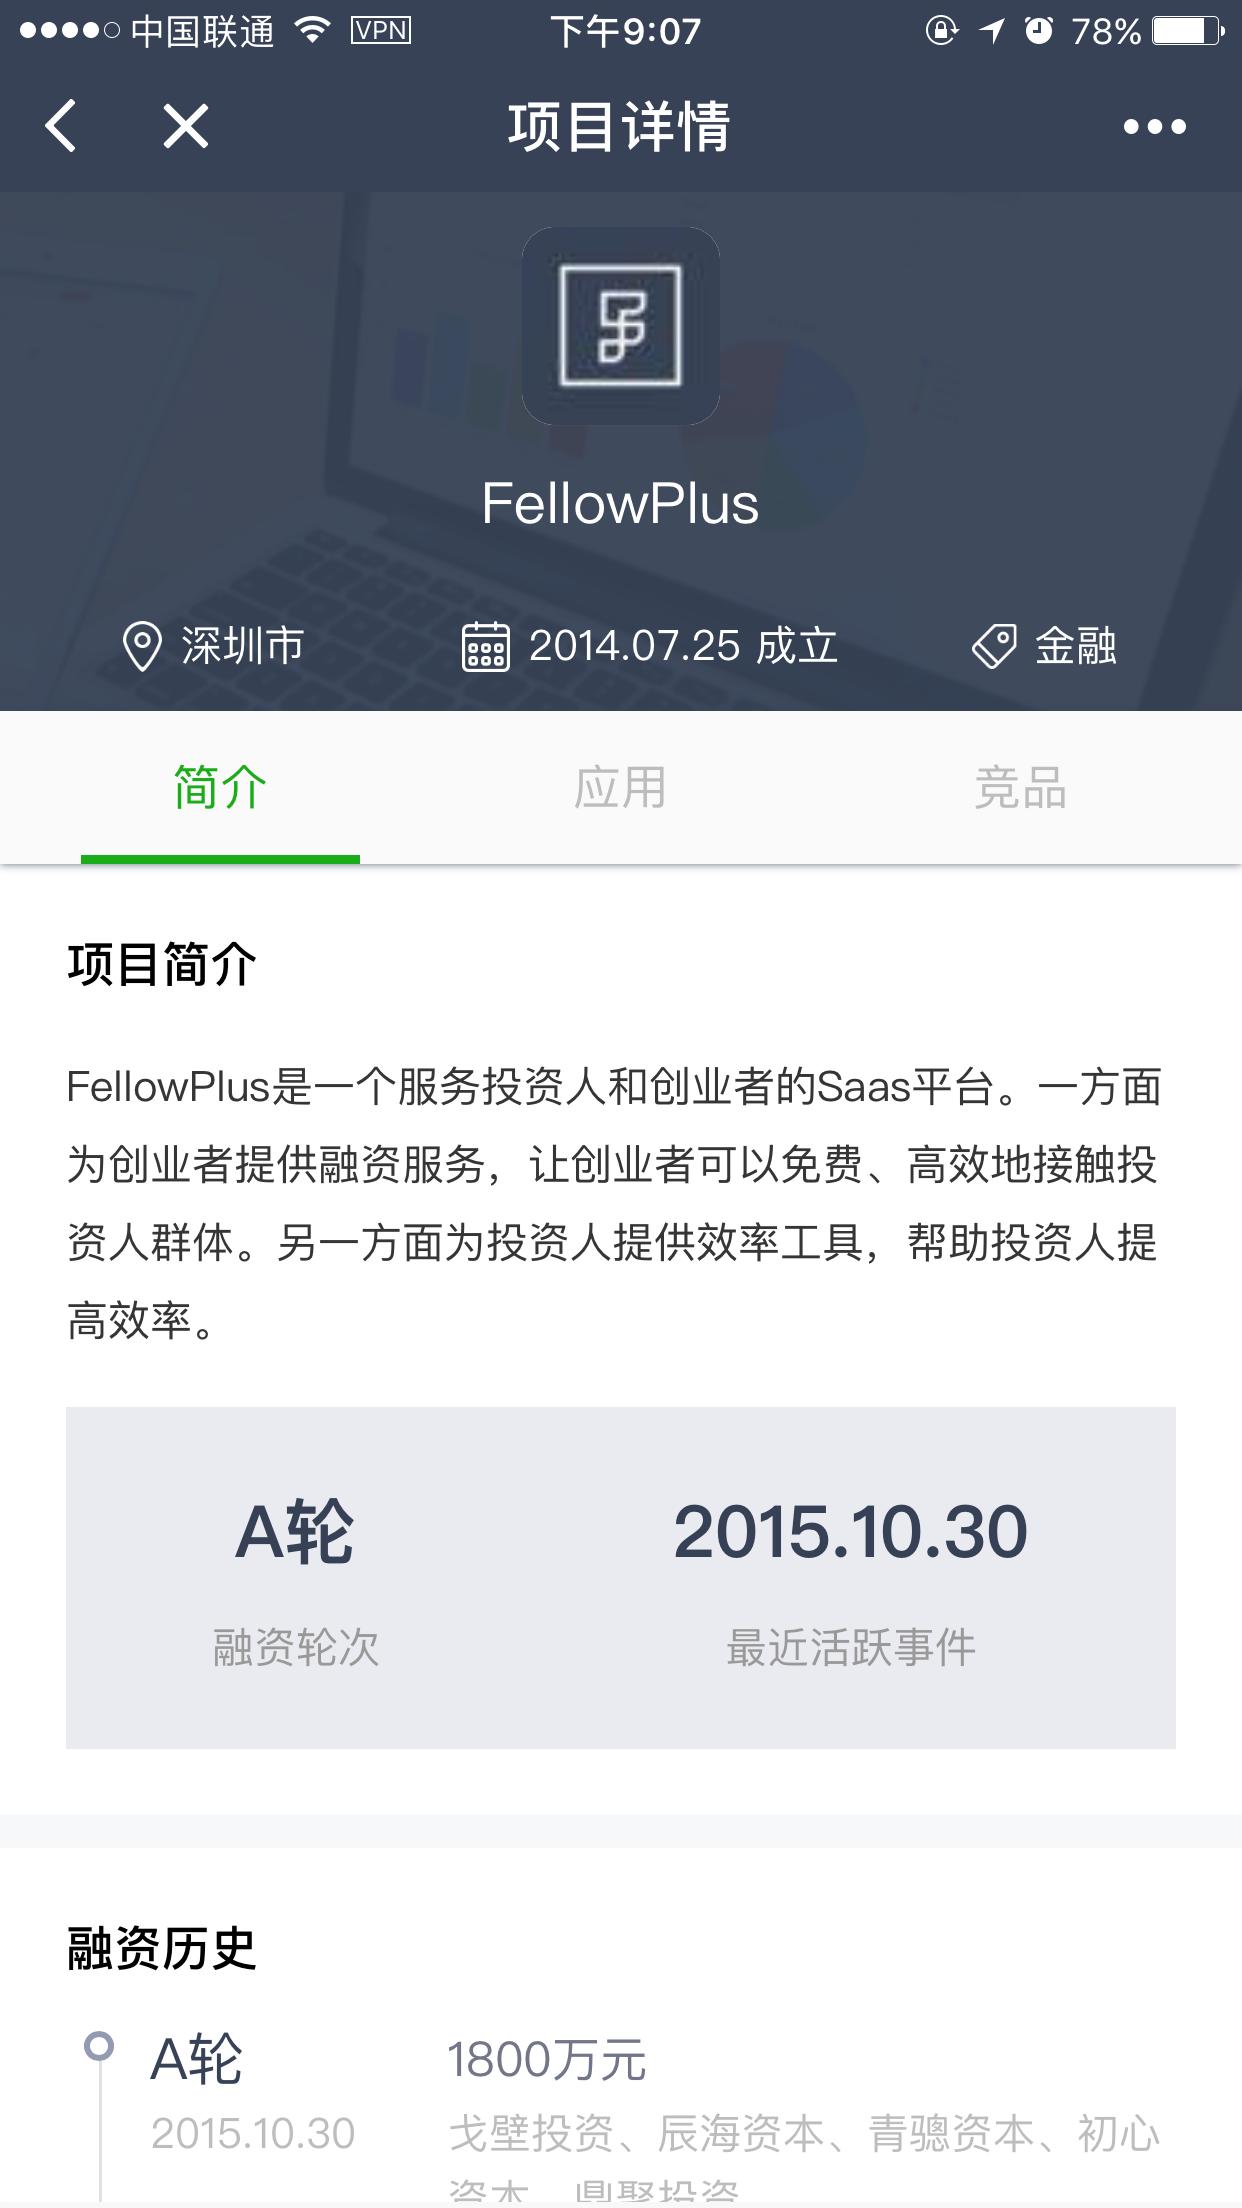 FellowPlus创投数据库小程序